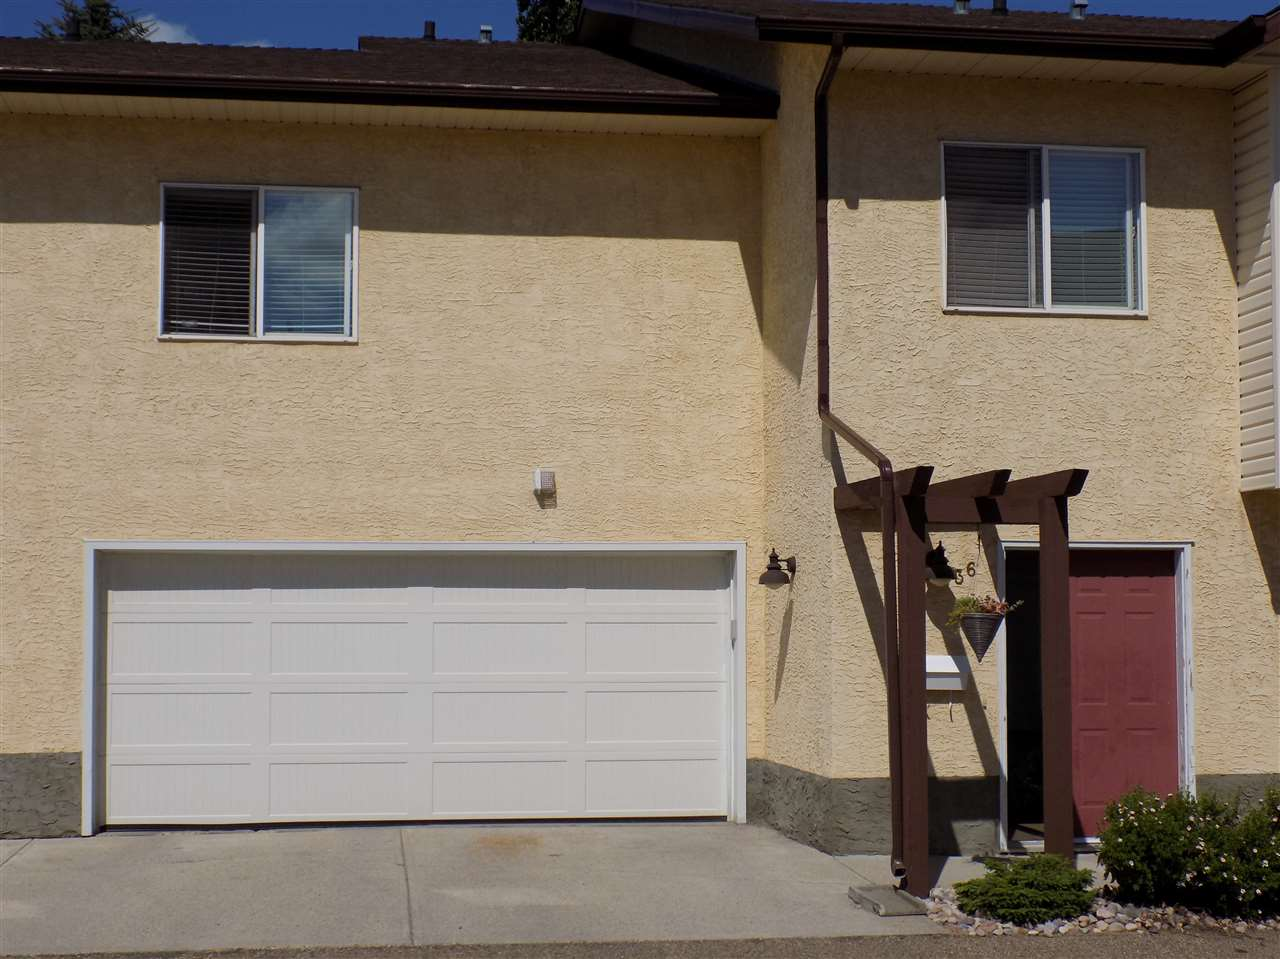 36 3811 - 85 STREET, 3 bed, 2 bath, at $239,900